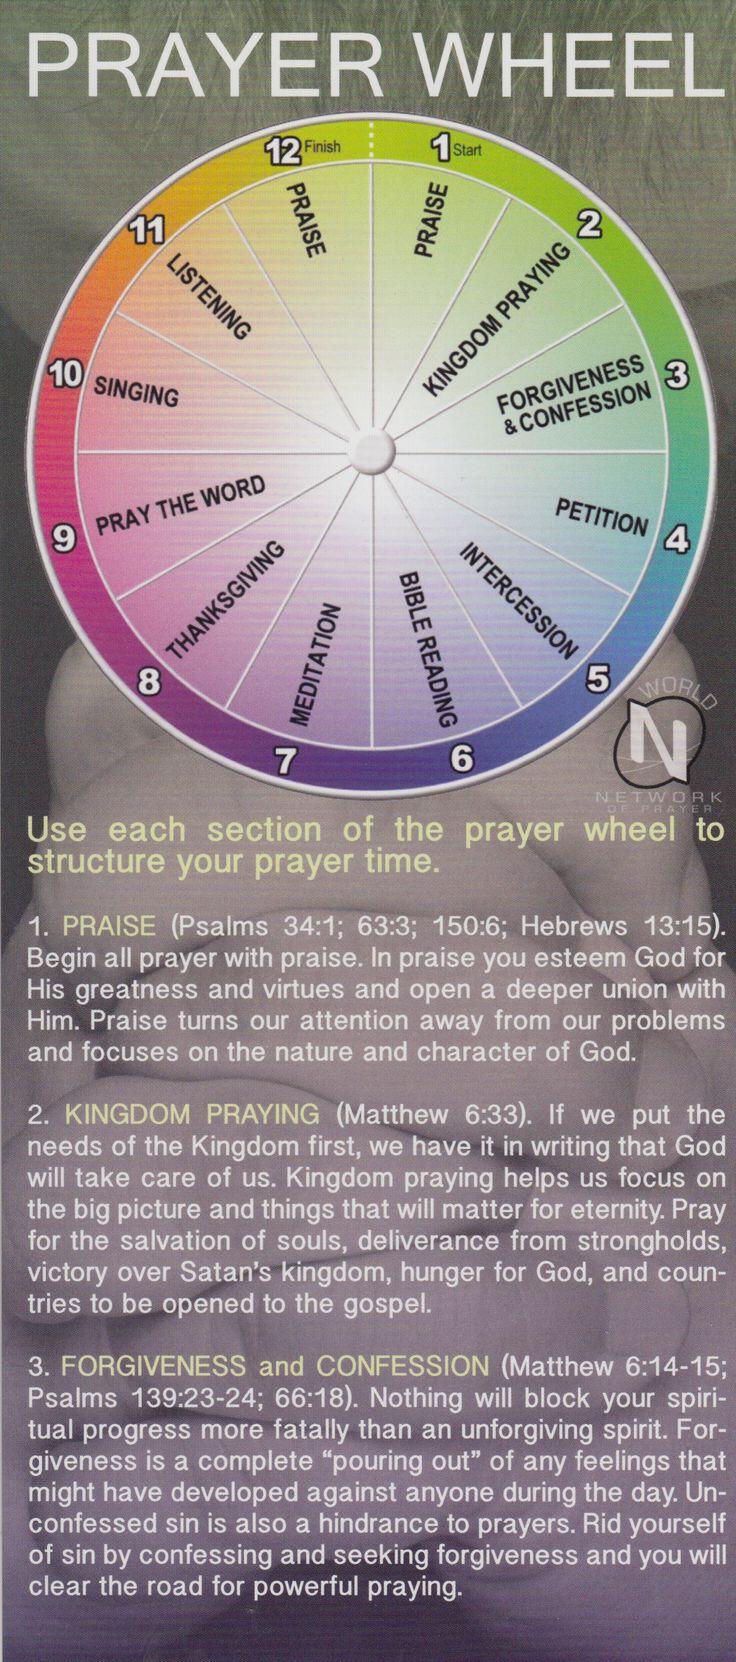 Pentecostal Publishing House Prayer Wheel Prayer Guide